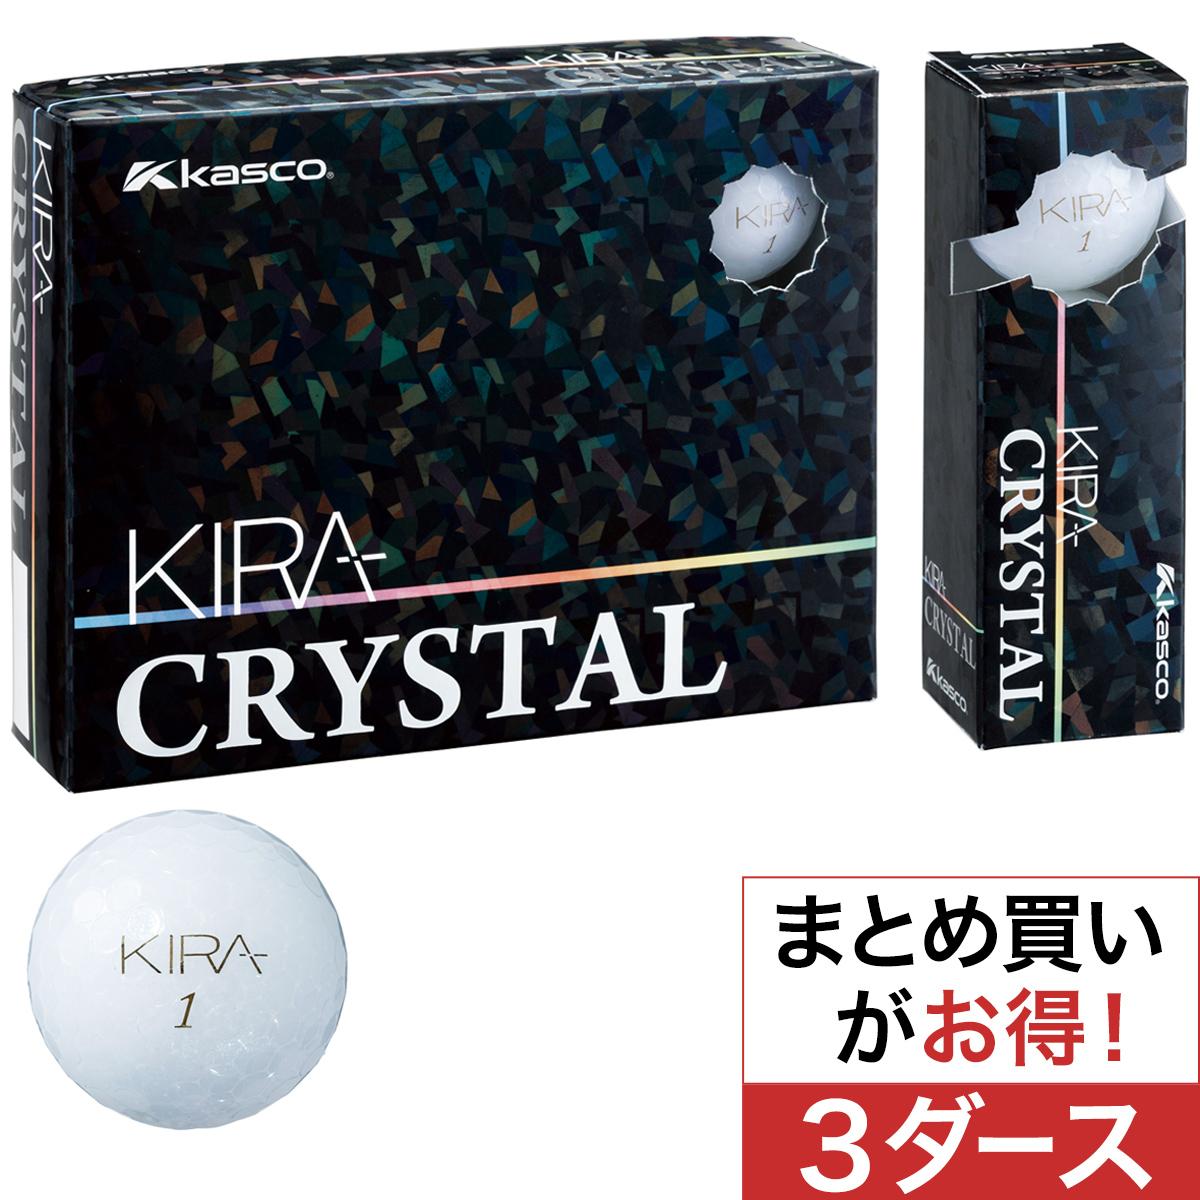 KIRA CRYSTAL ボール 3ダースセット